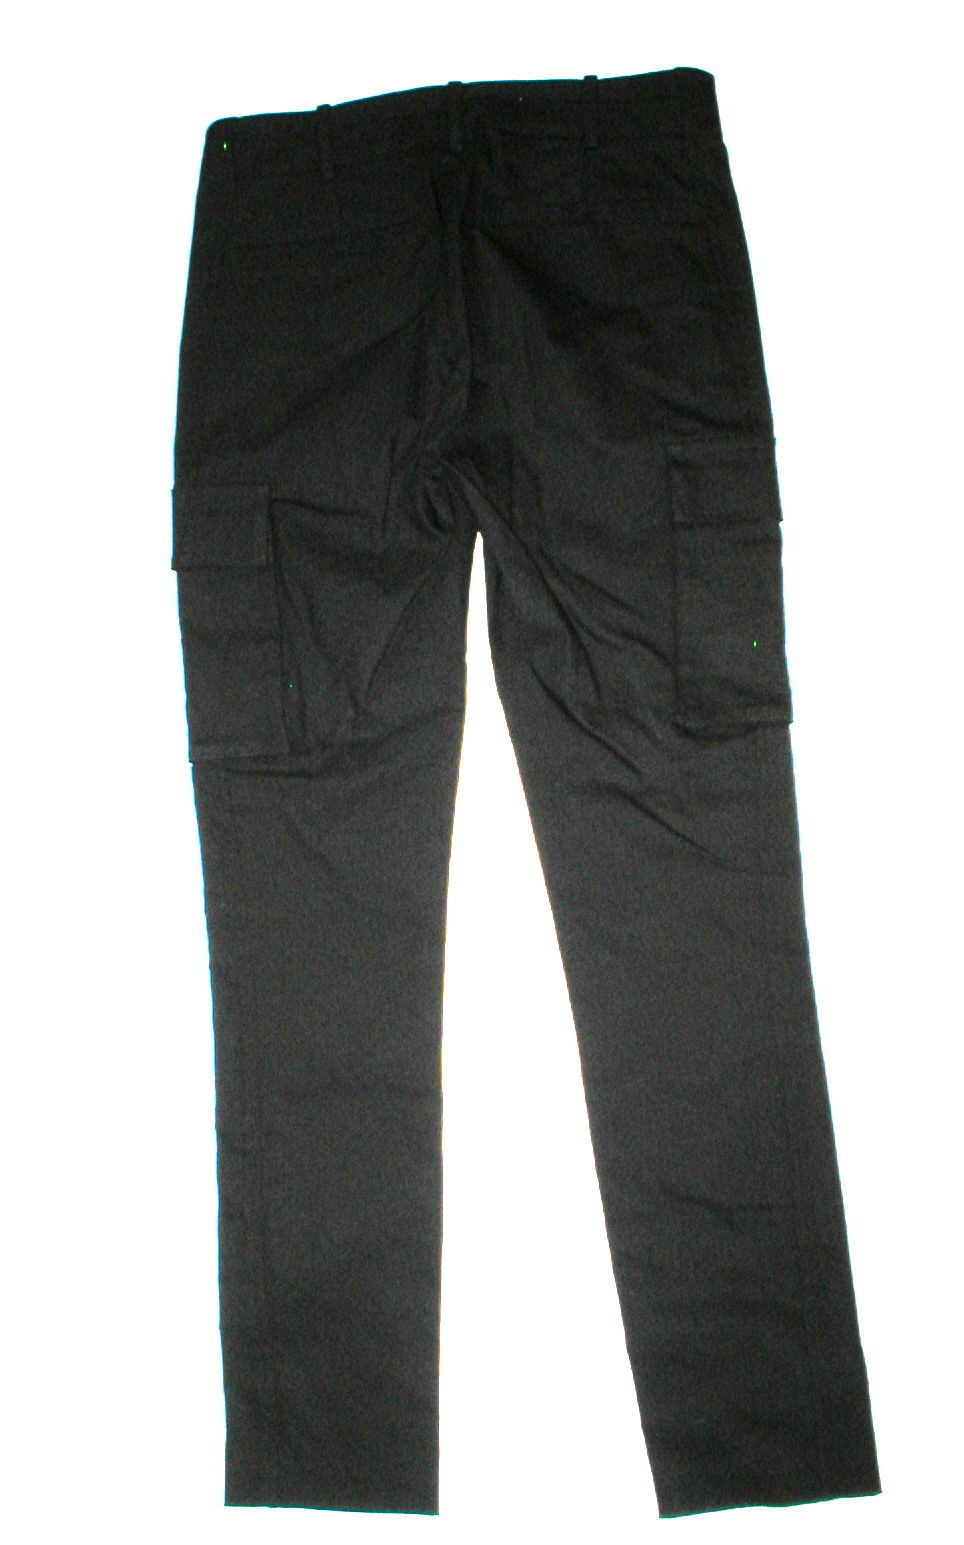 New Womens Designer NWT LAMB Gwen Stefani Cargo Pants Stretch Skinny 6 Black image 8